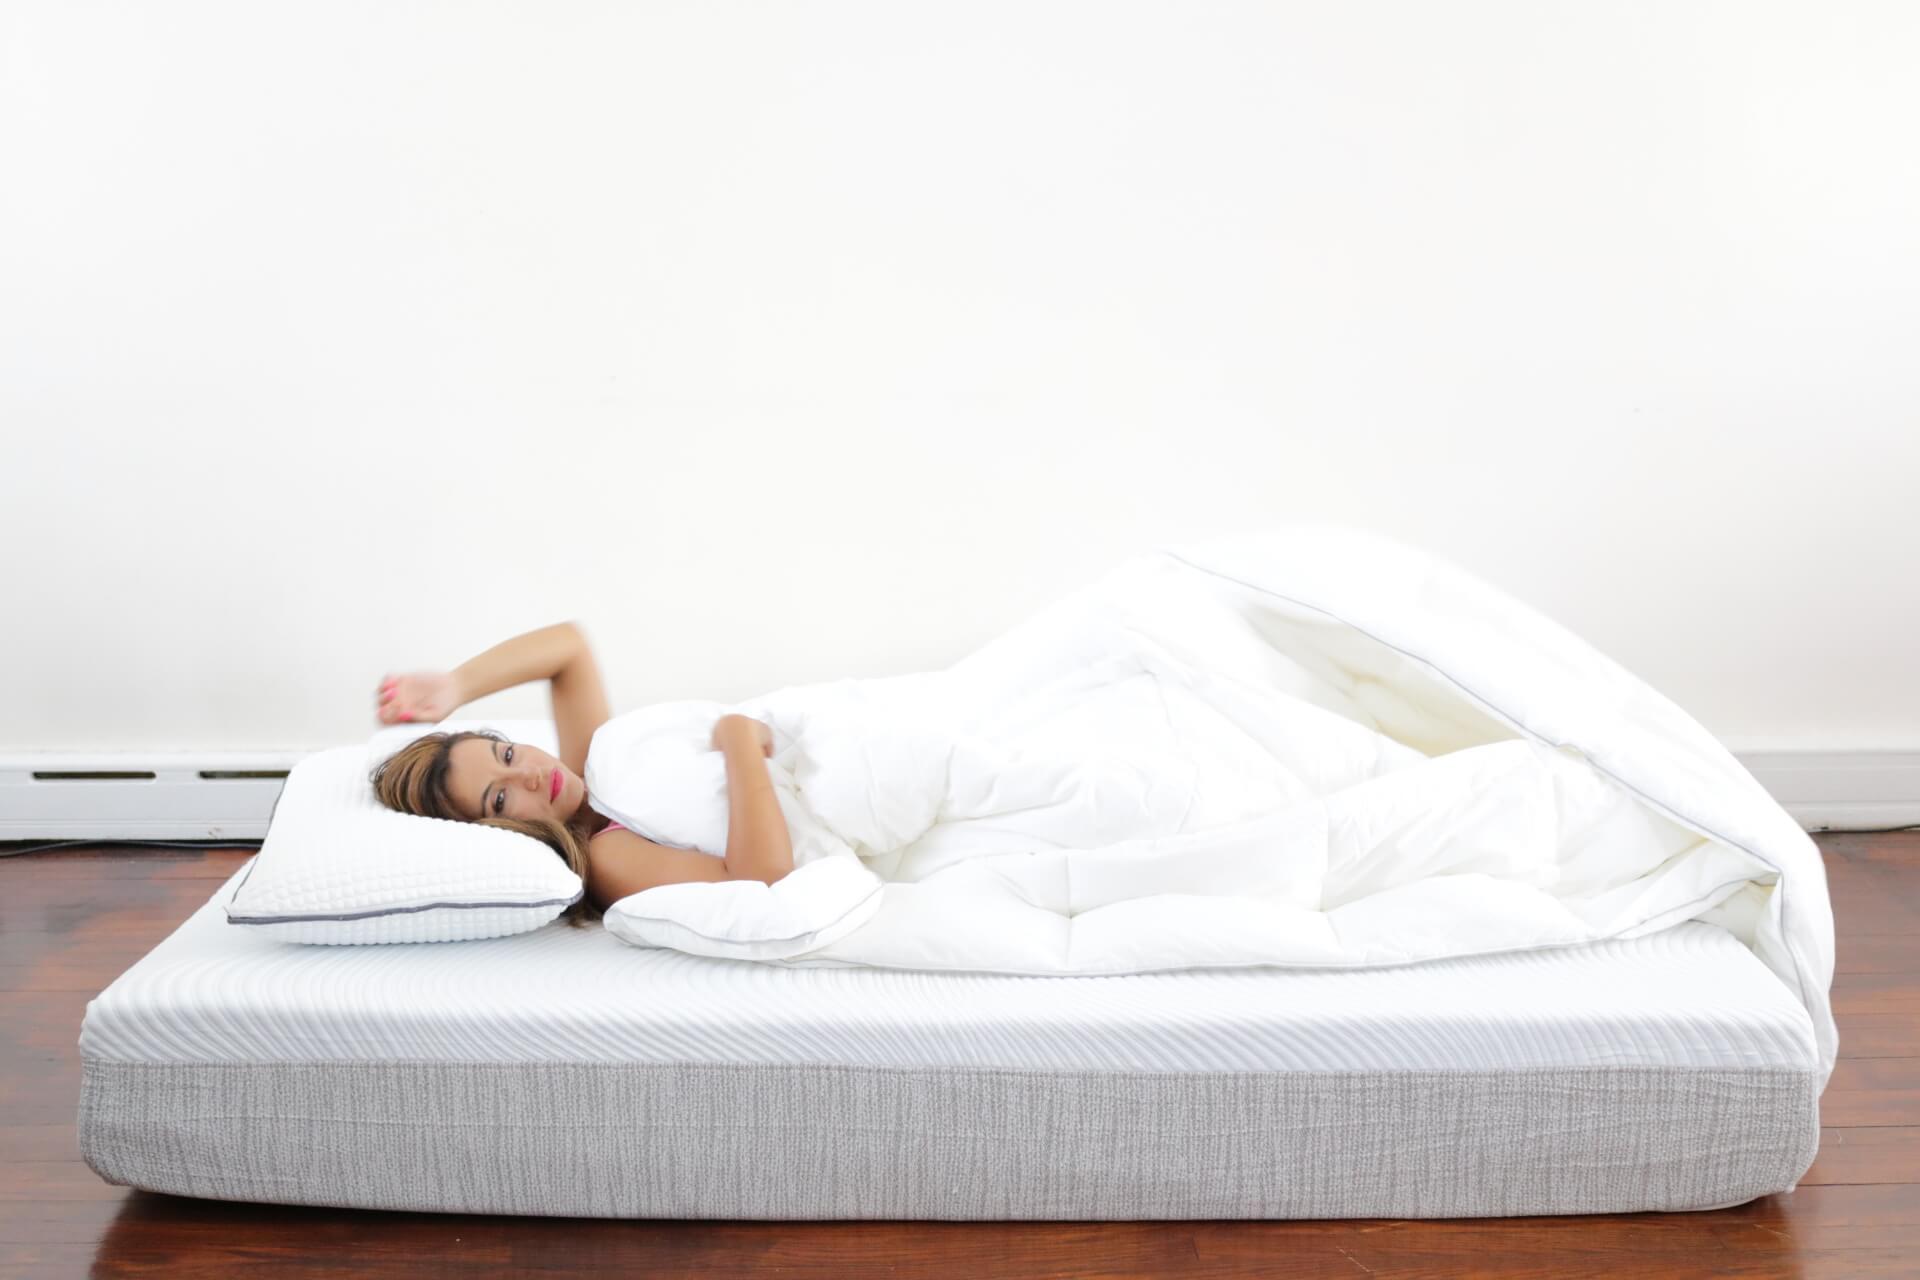 tomorrow sleep mattress review - Girl On The Mattress